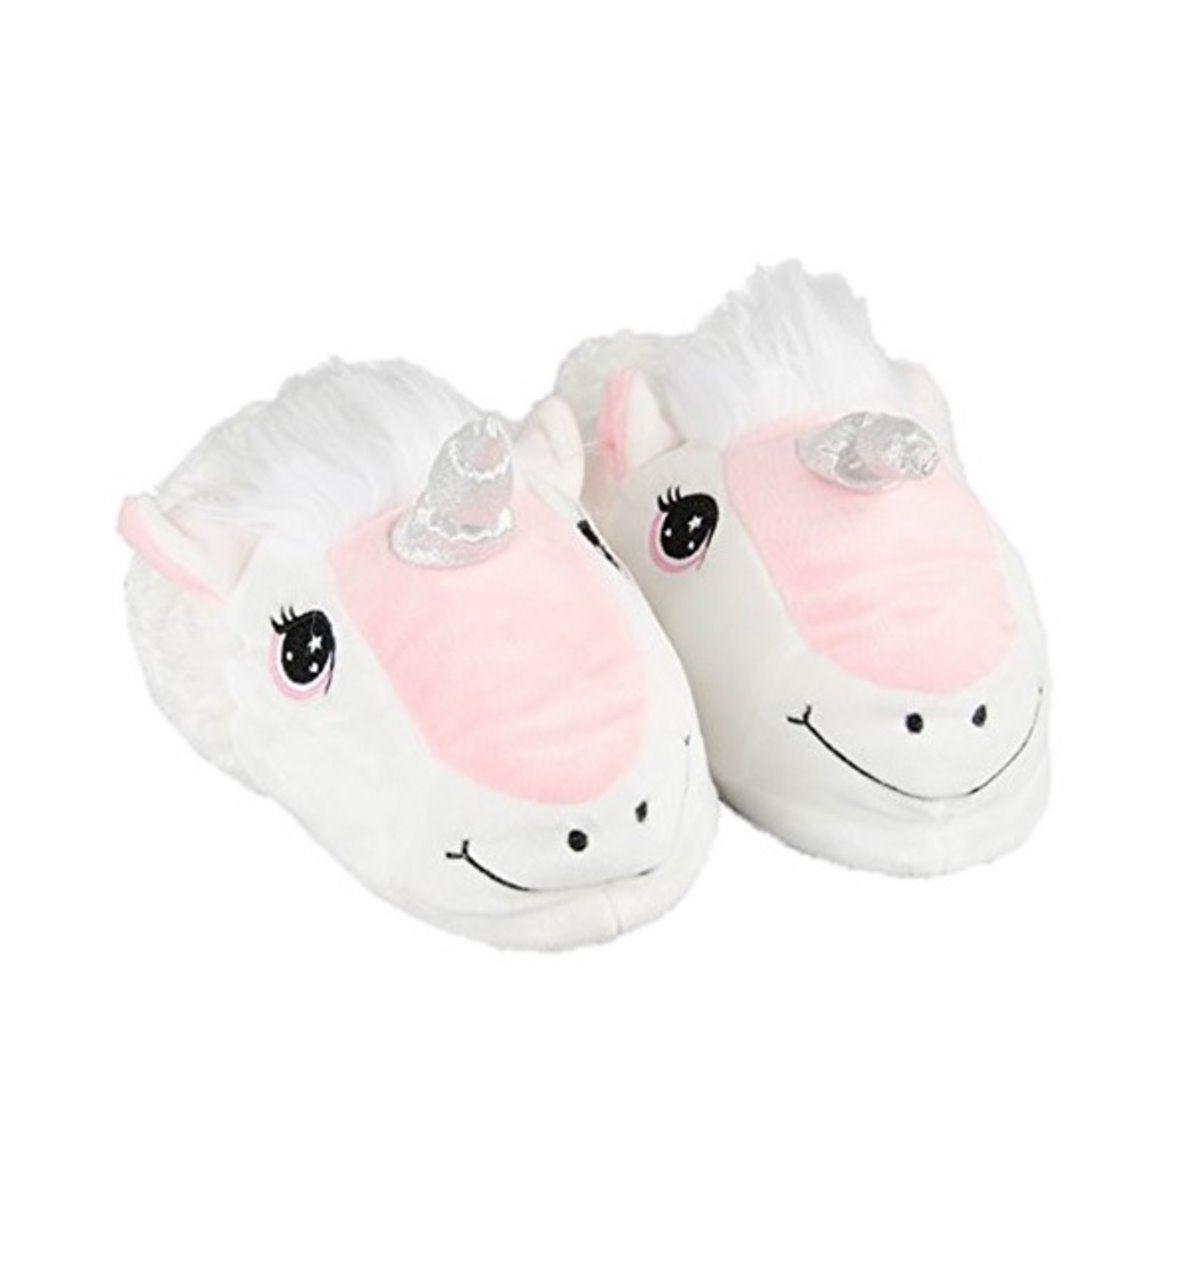 Donna Ragazze Unicorn Pantofole Peluche Morbido